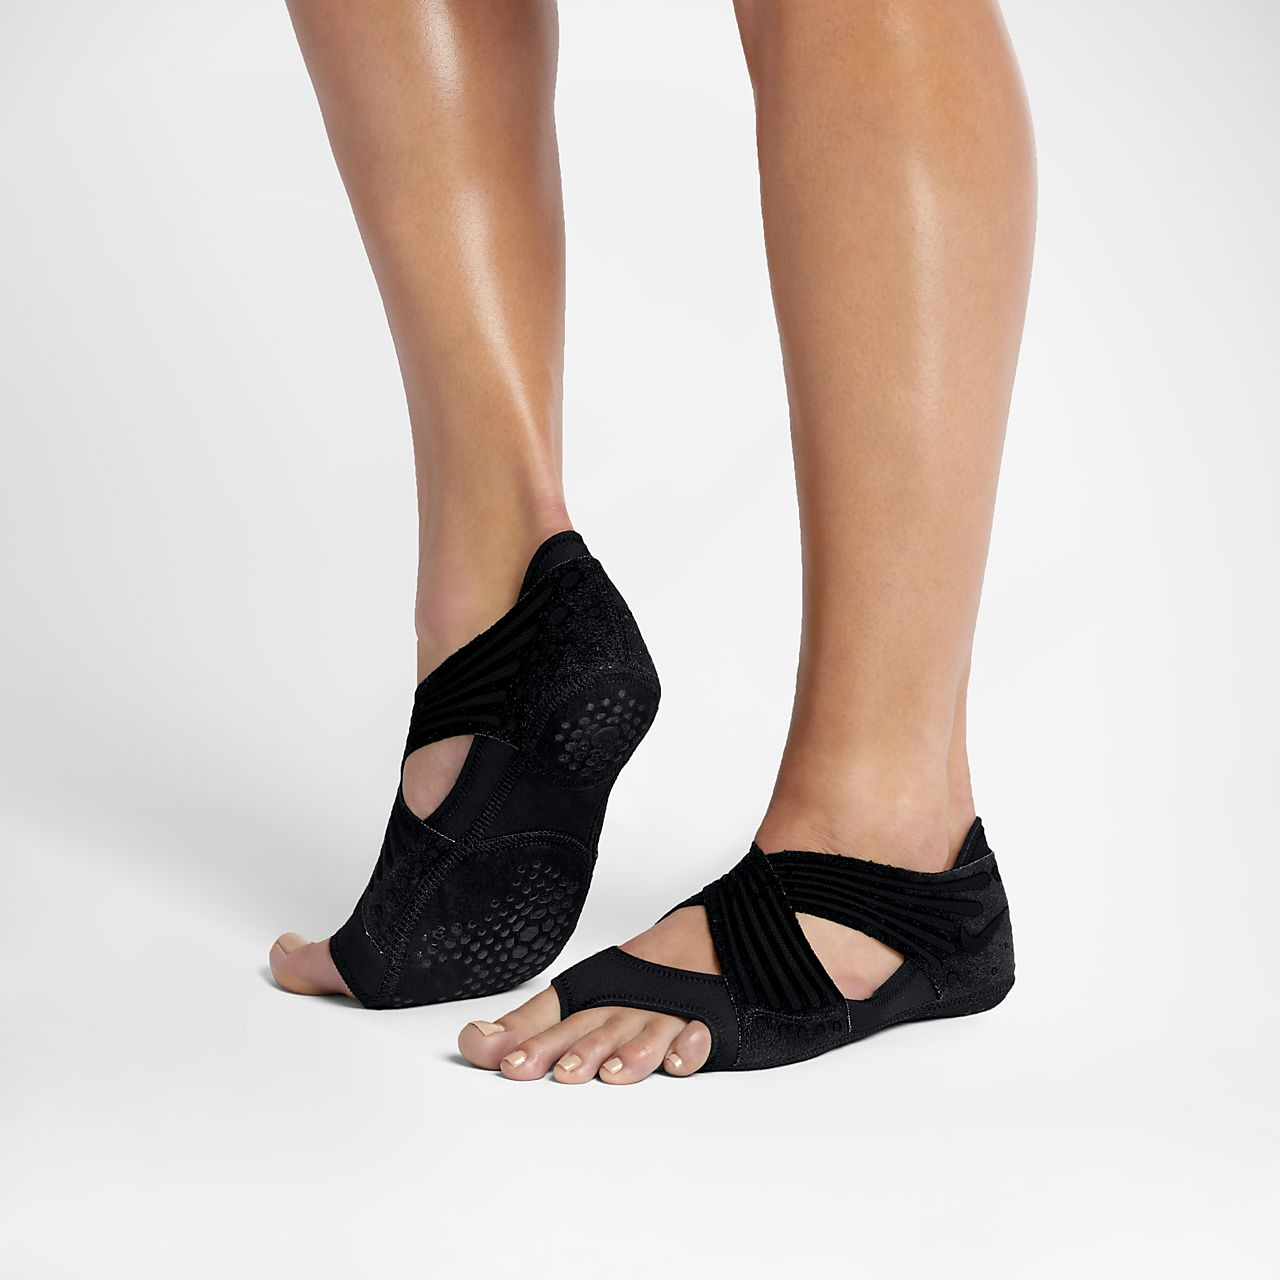 info for 9b9a0 345a9 ... aliexpress calzado de entrenamiento para mujer nike studio wrap 4 372c1  94707